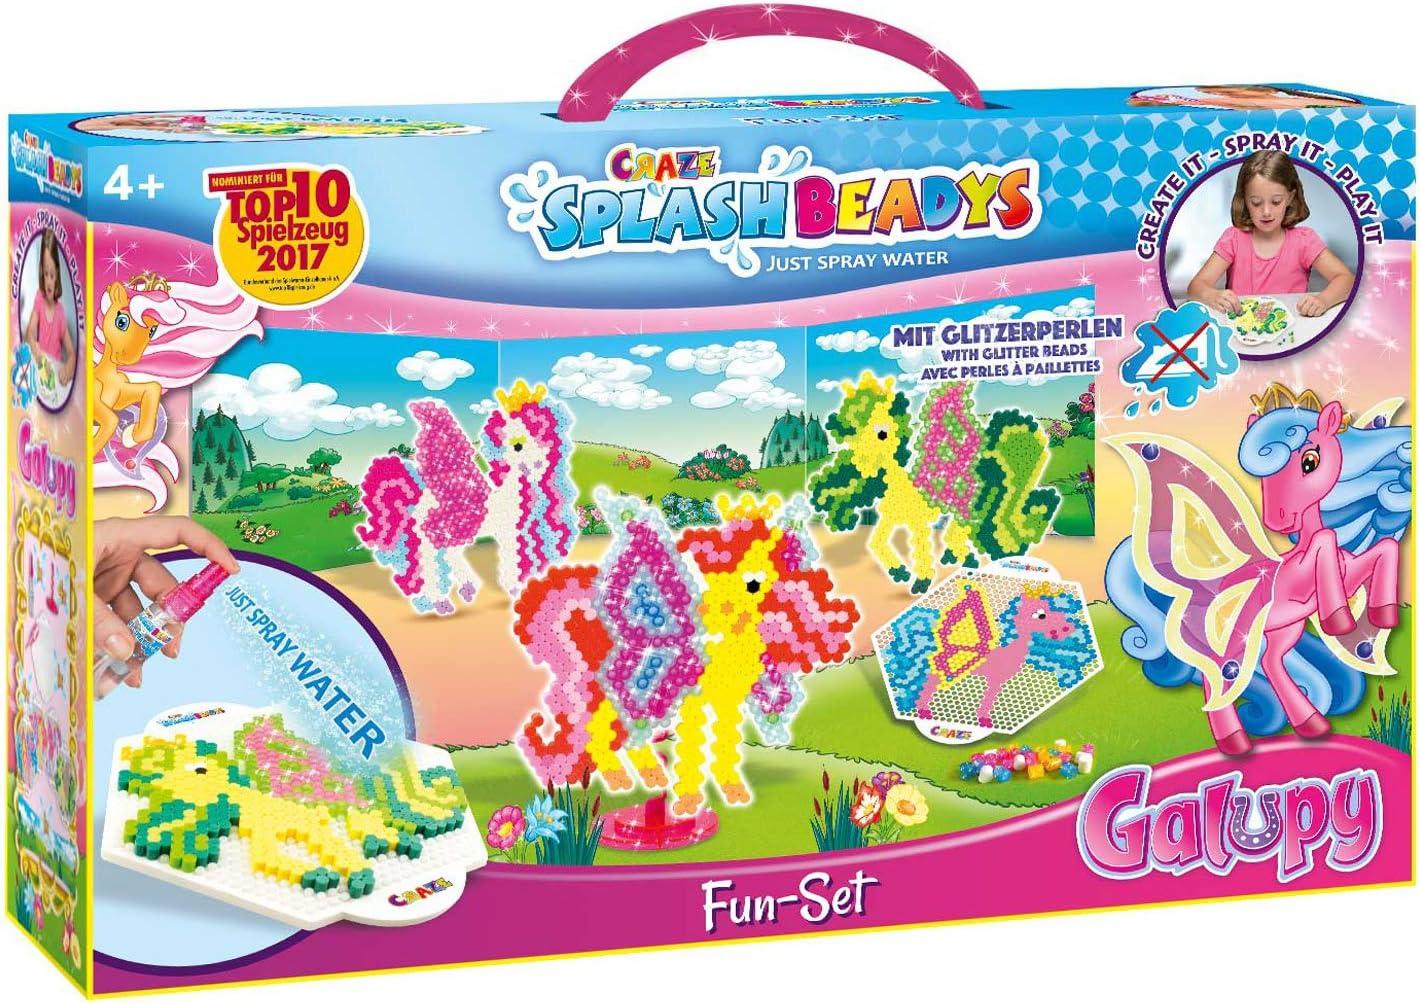 CRAZE SPLASH BEADYS Fun Set GALUPY Kit cavallo artigianale per bambini perline 12253